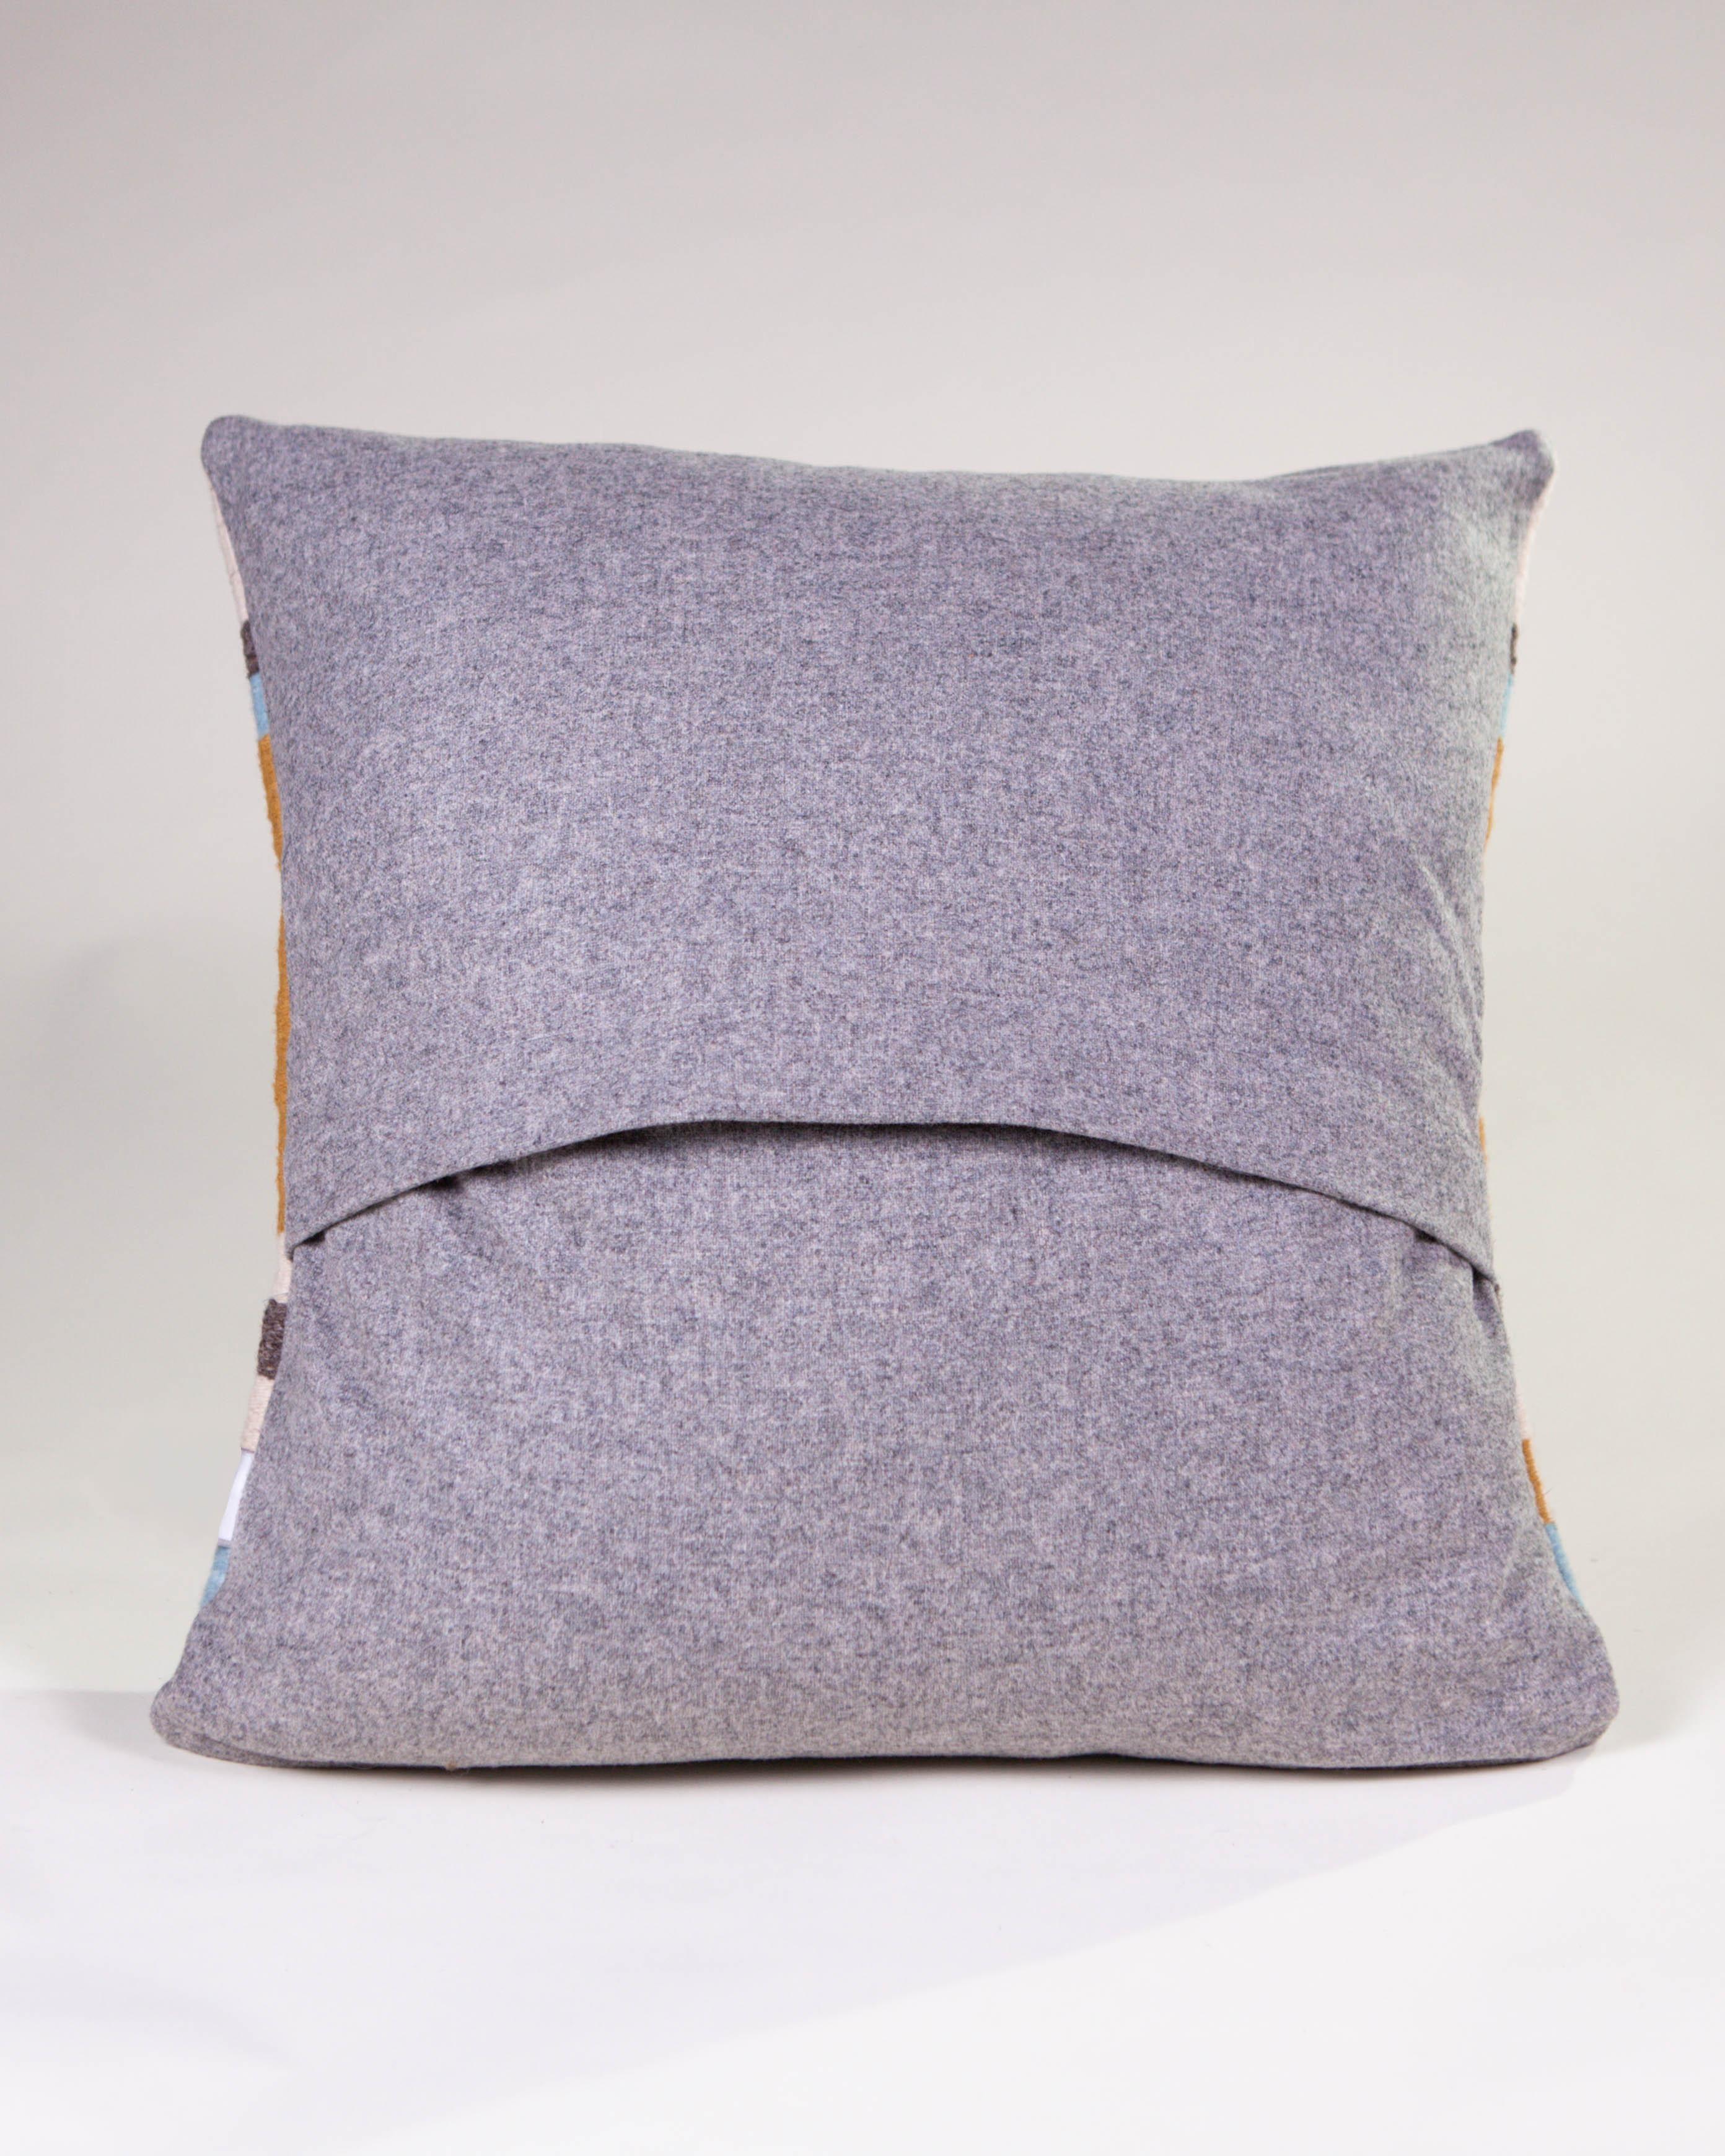 Boho Style Wool Throw Pillow in Ochre